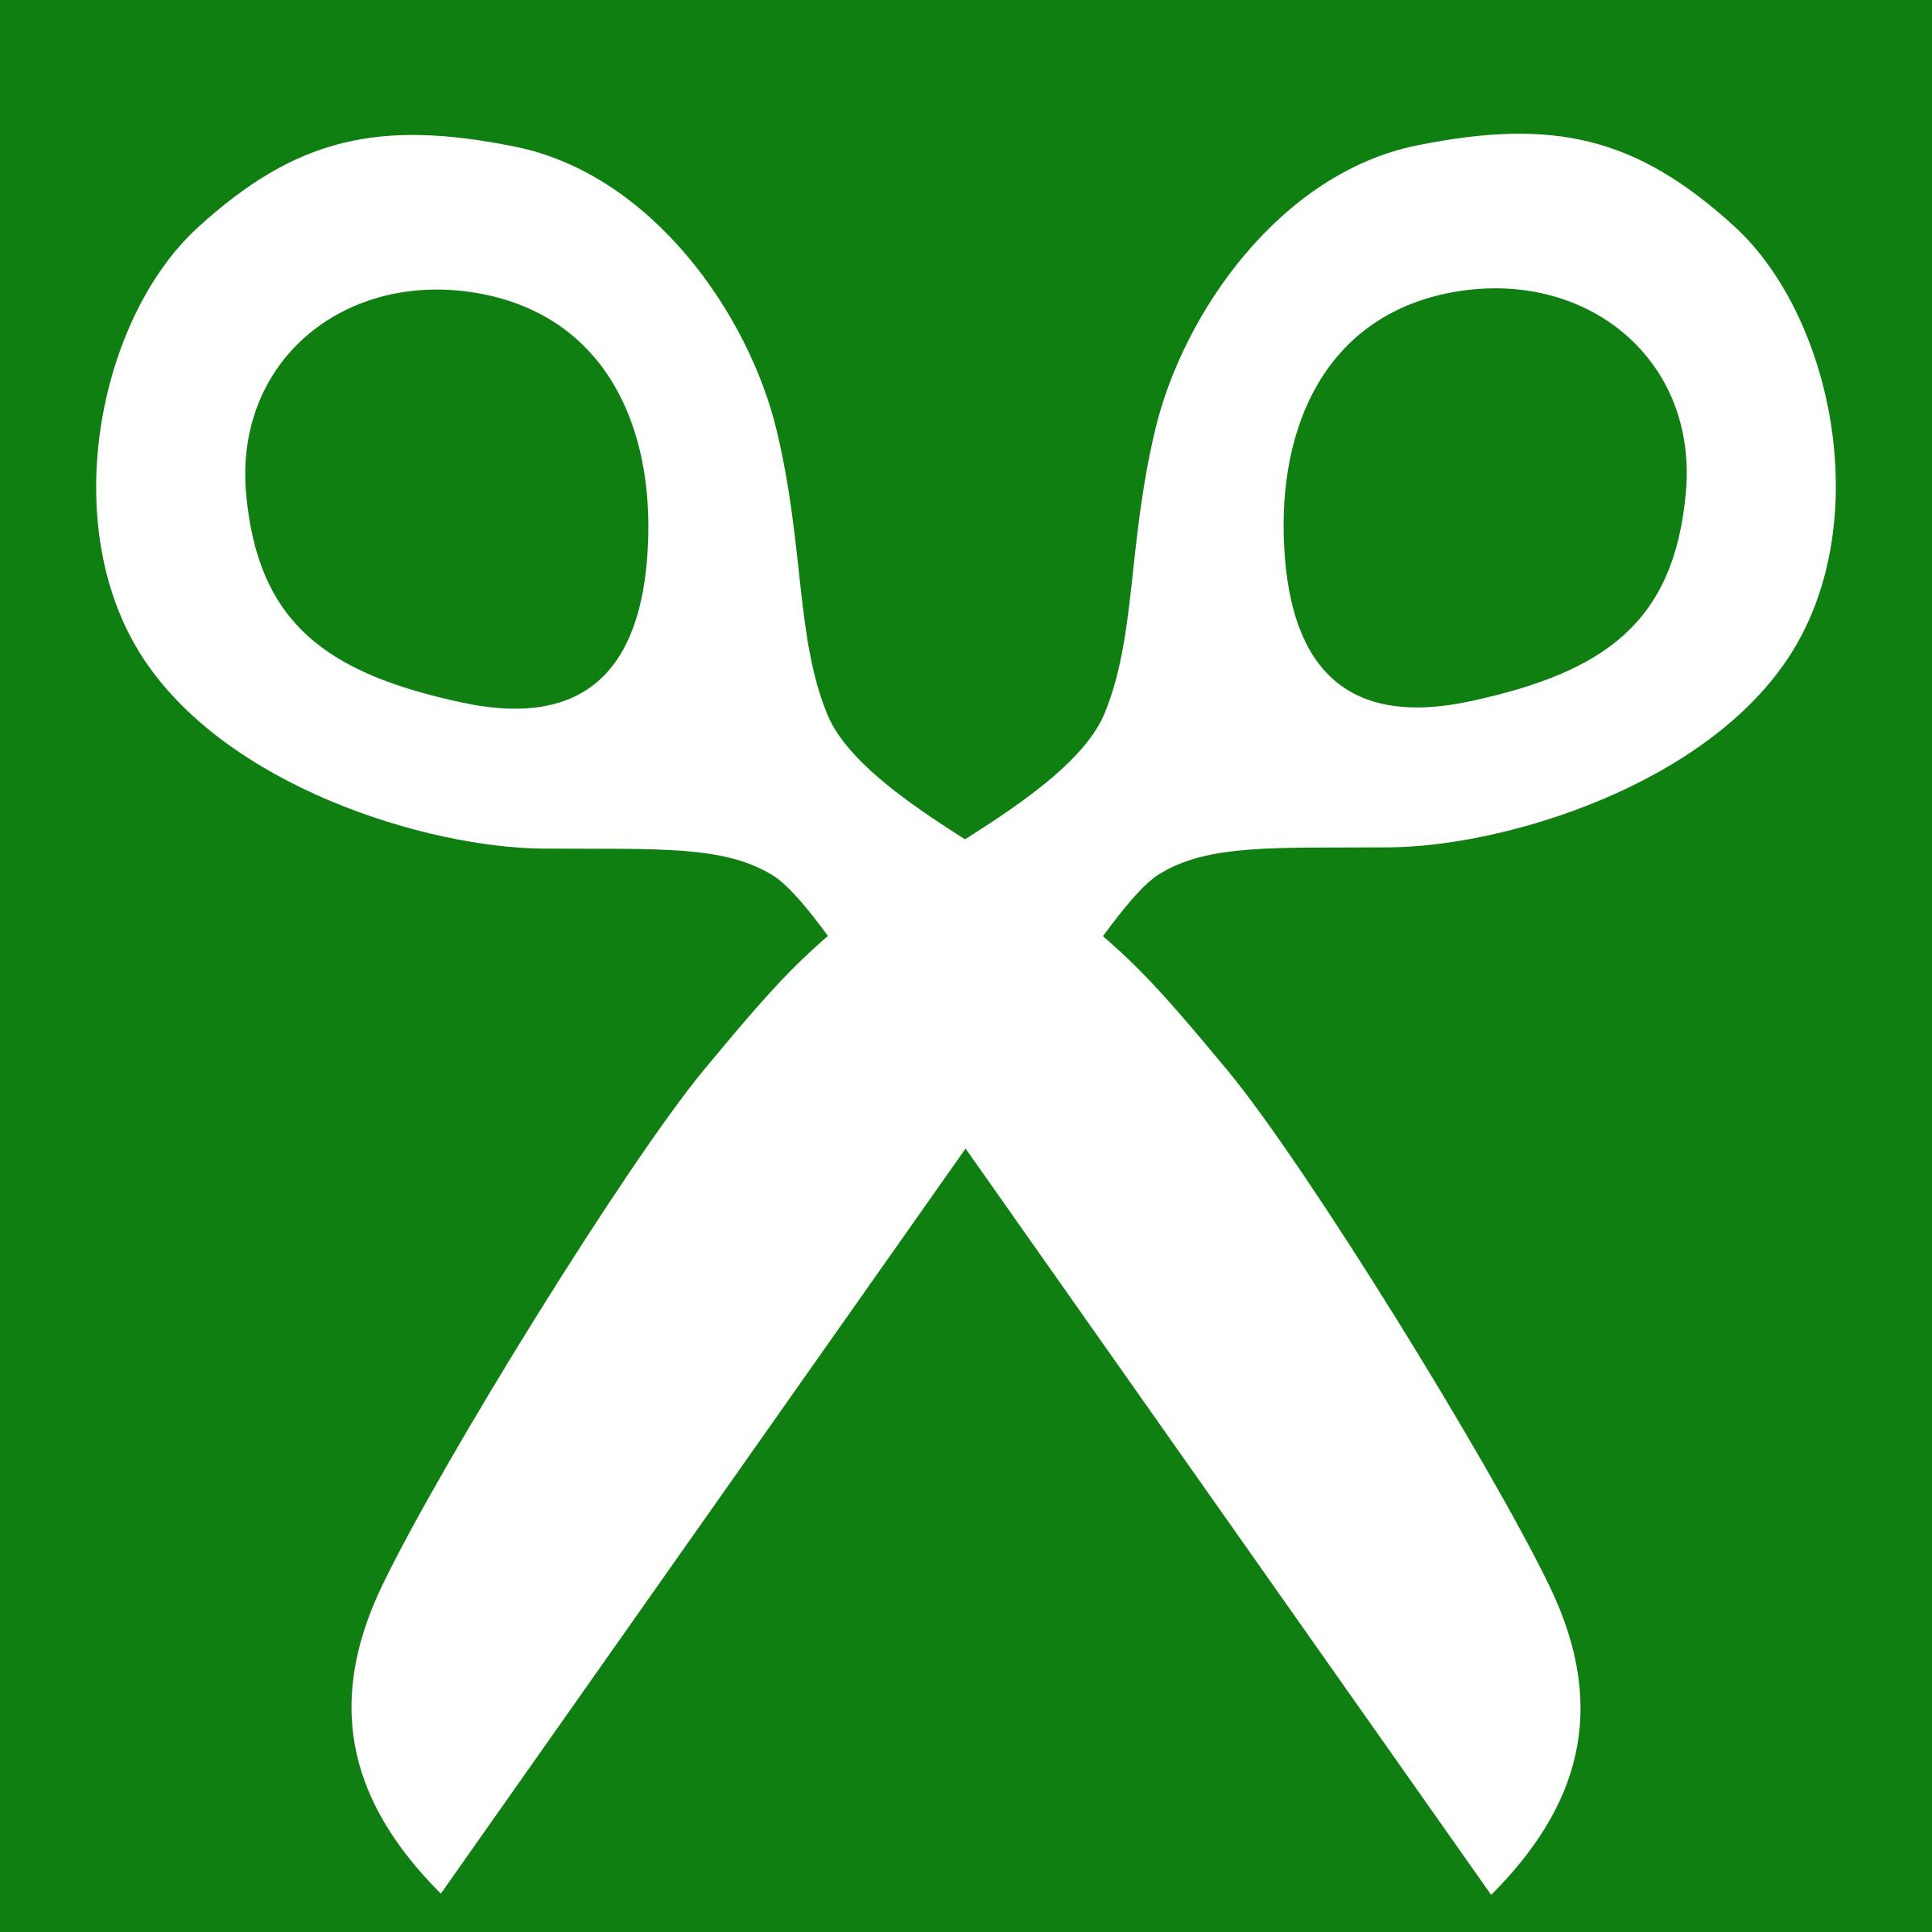 restaurant logo clipart - photo #31